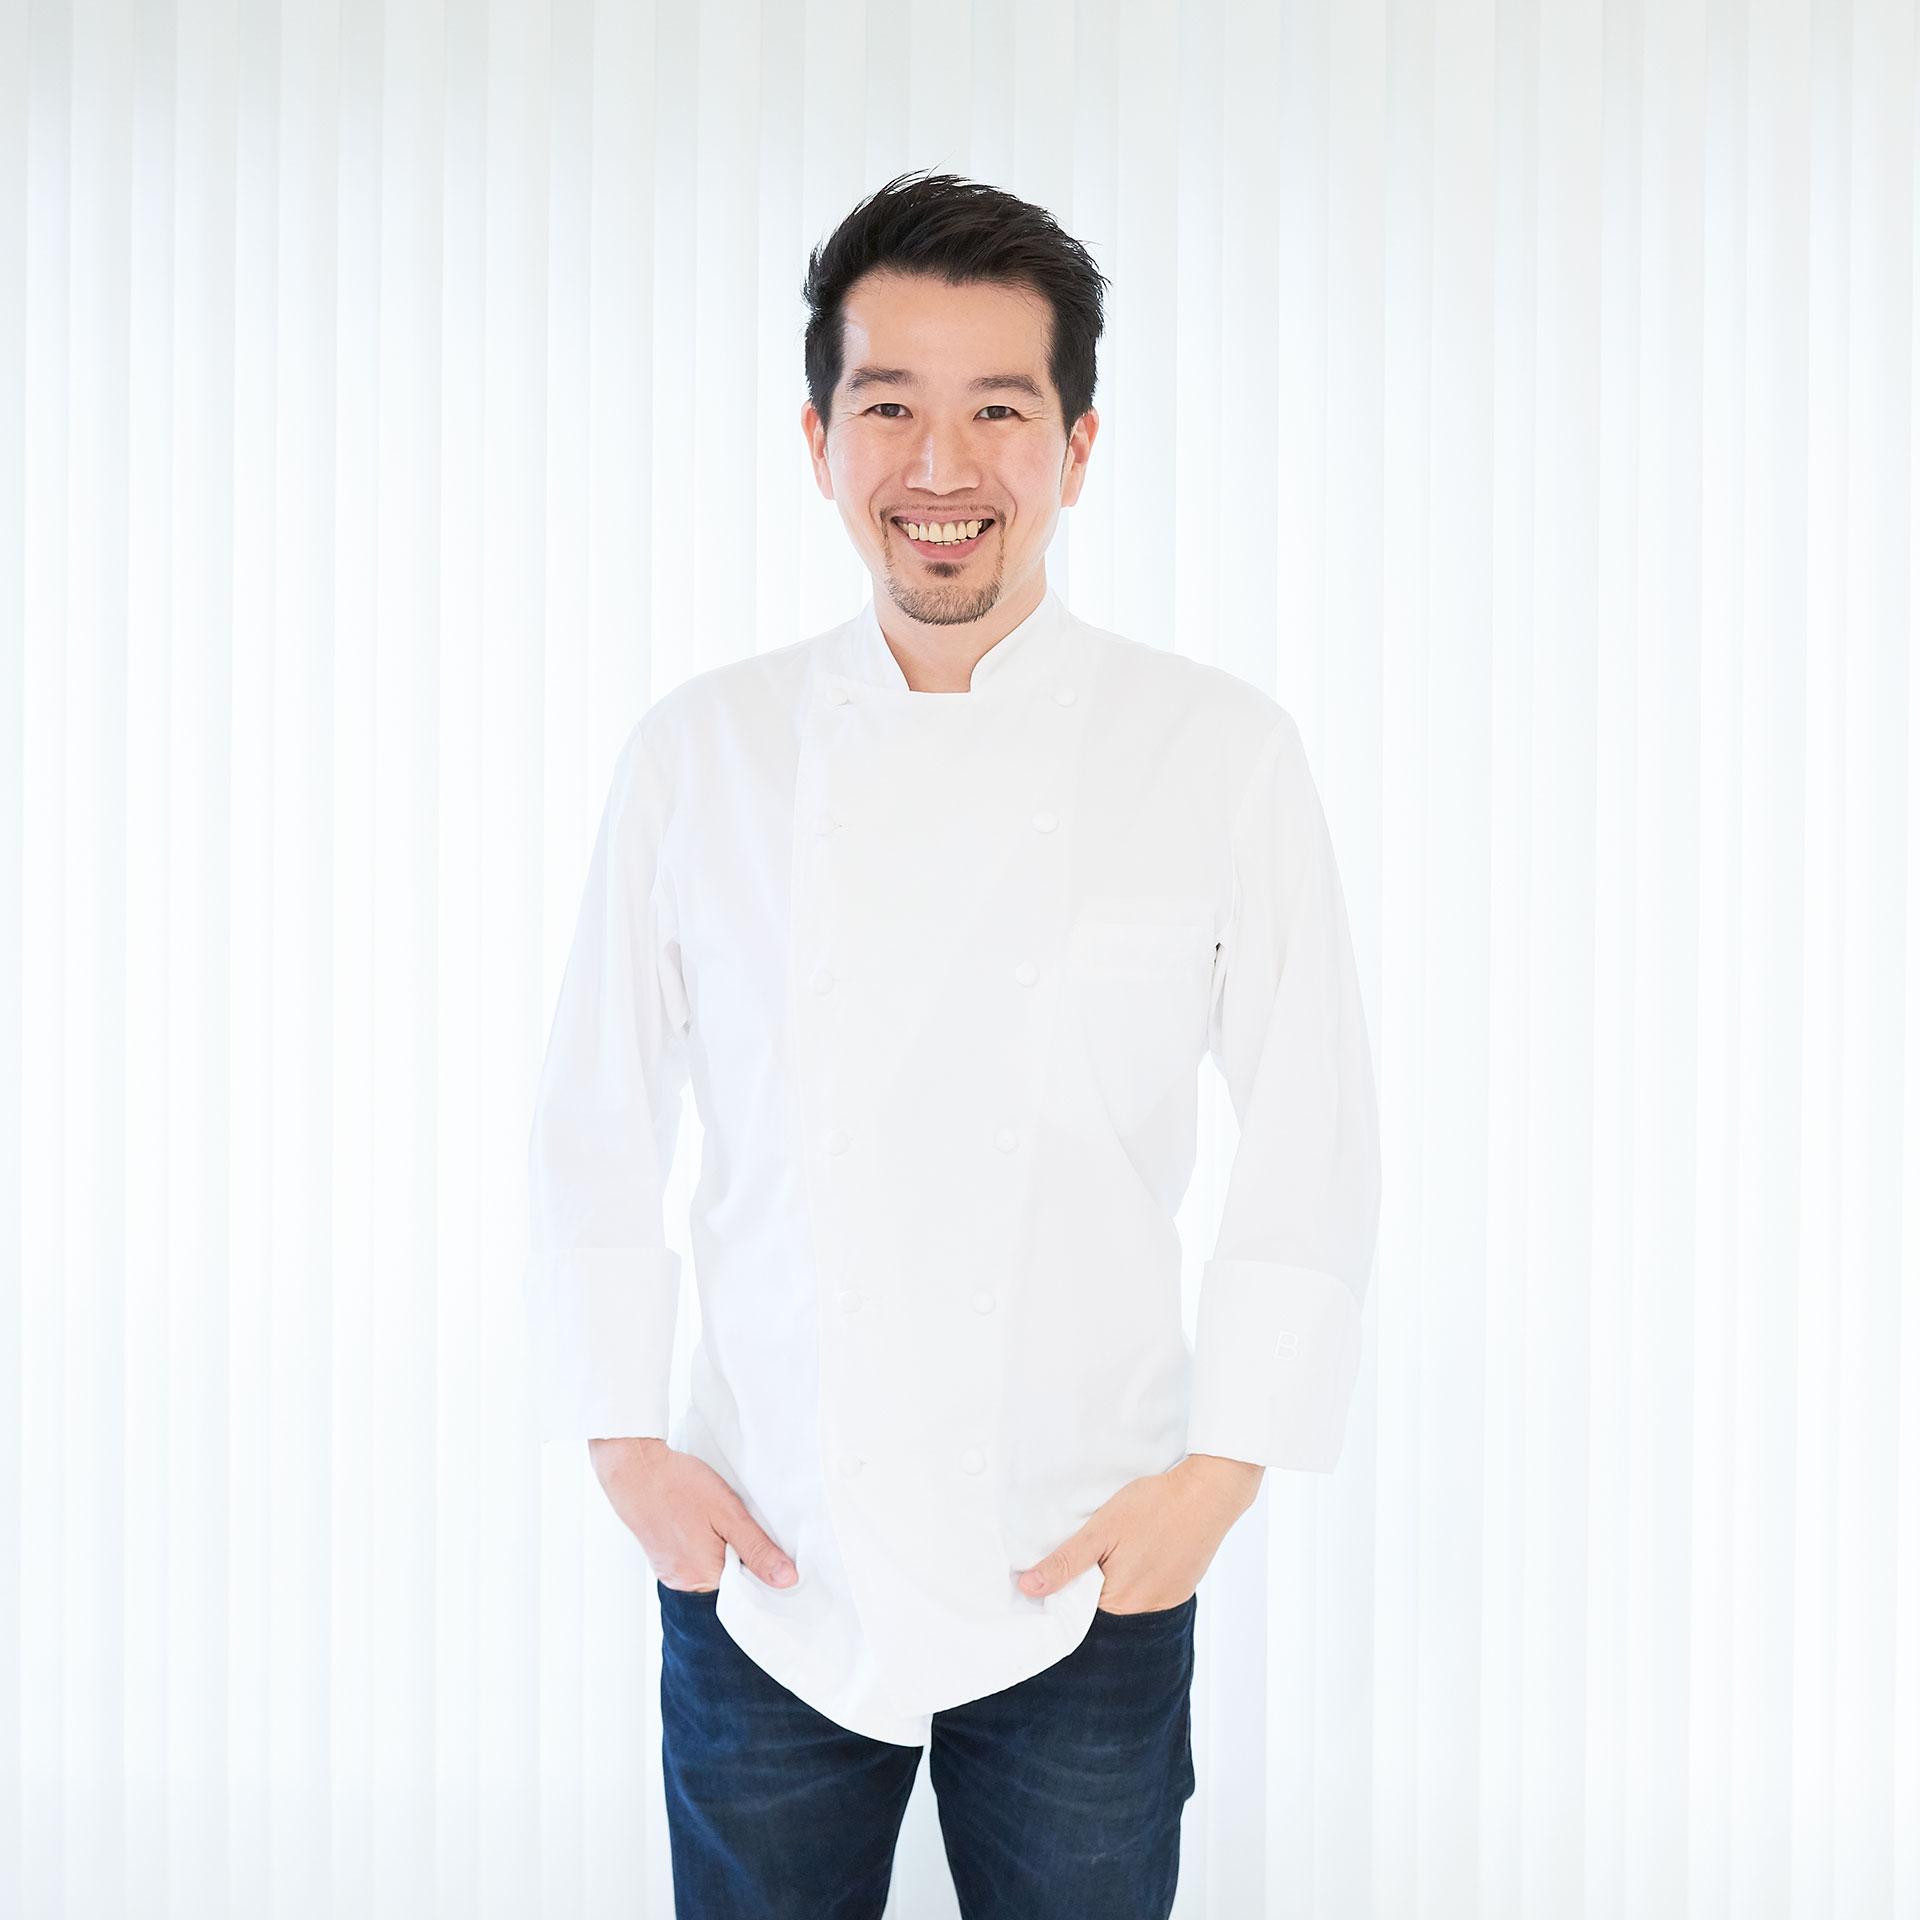 Marc Matsumoto